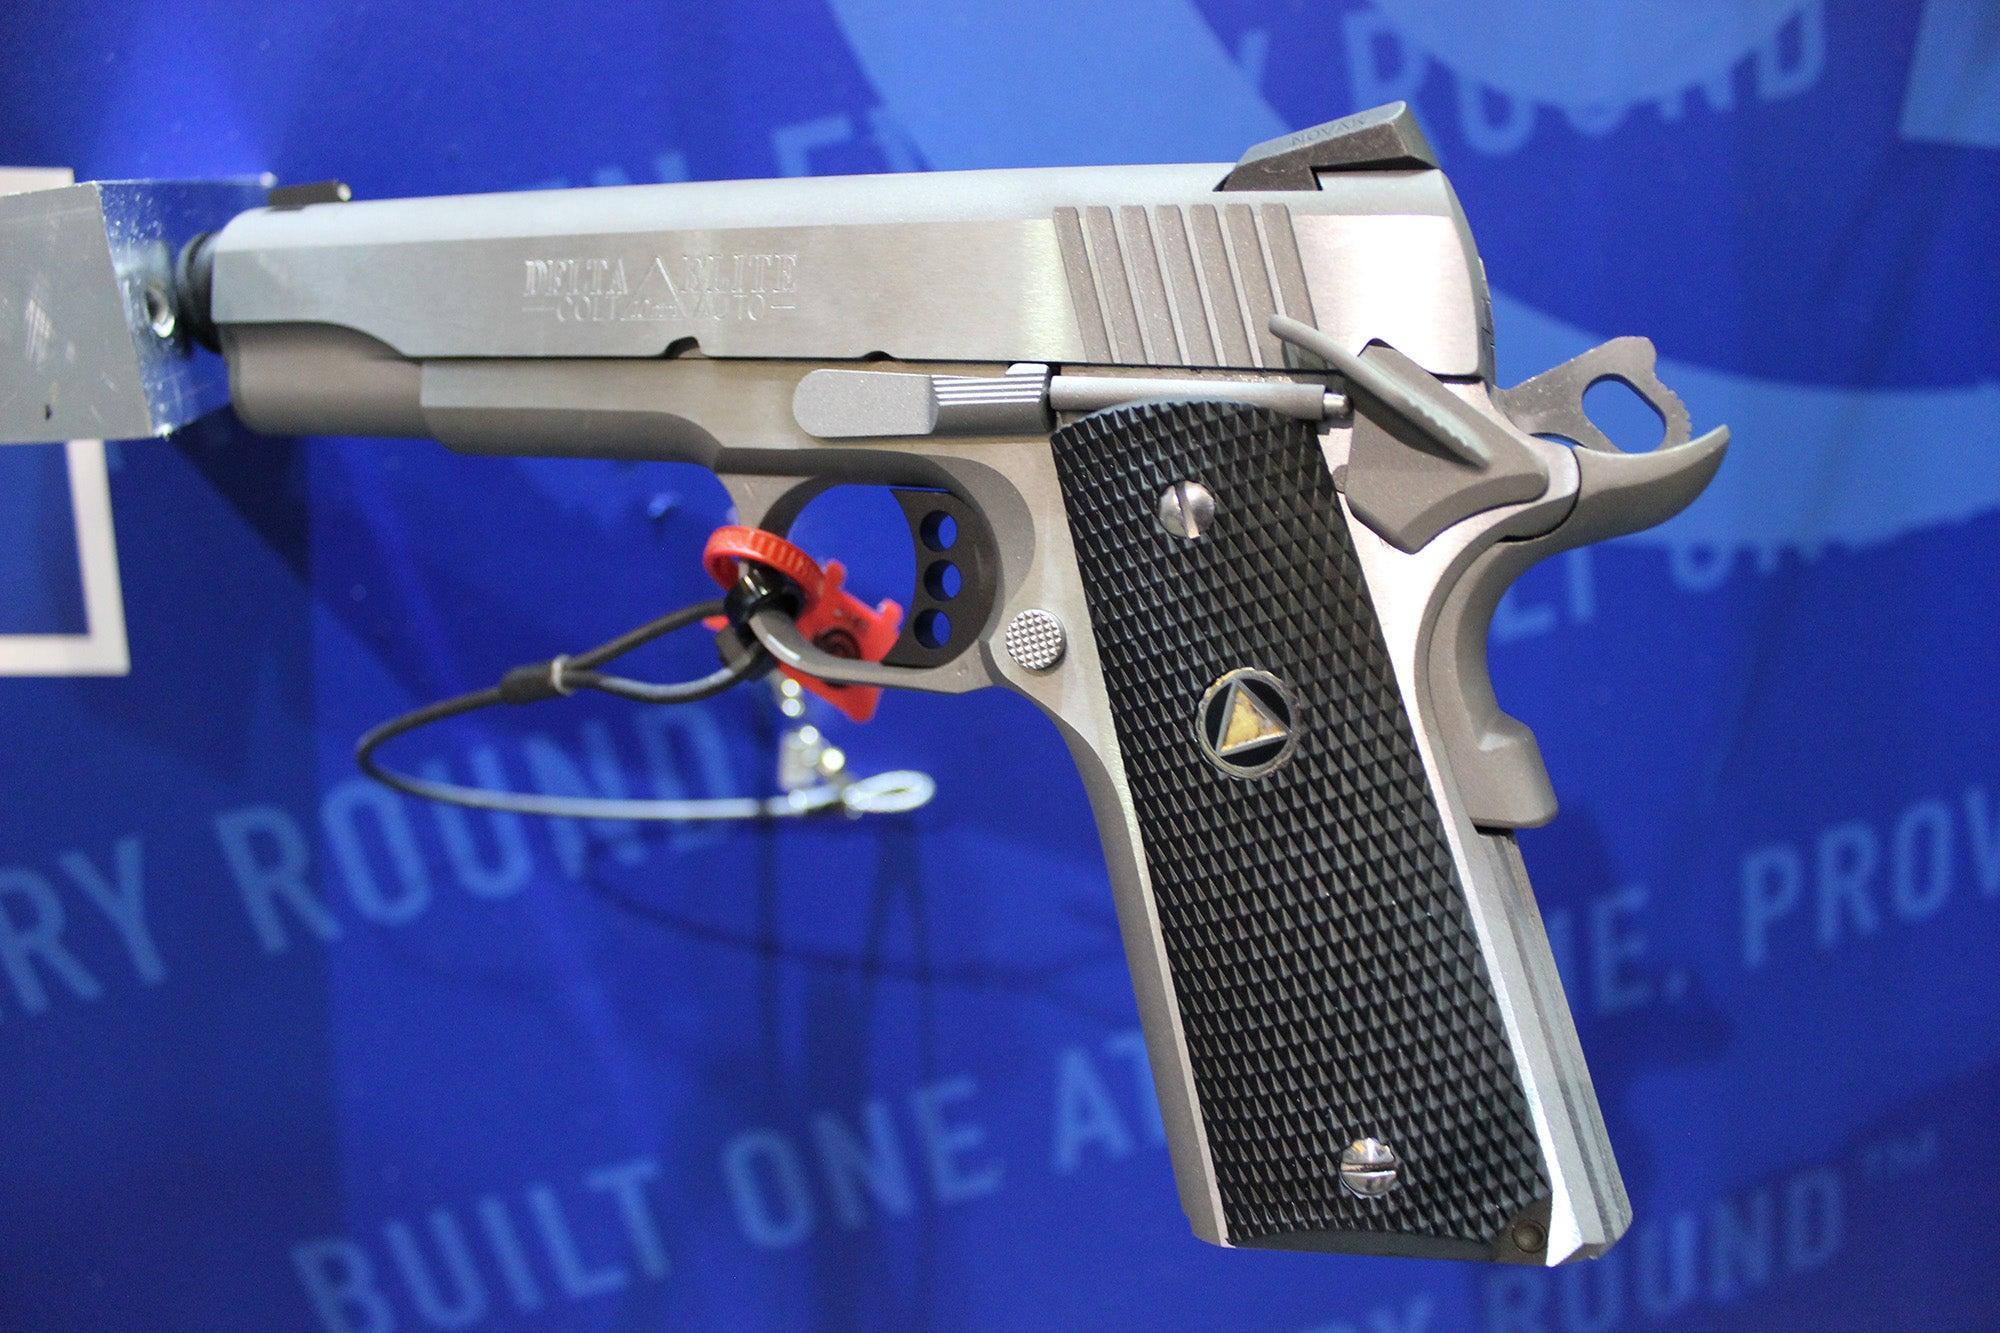 Best Handguns for Hunting from SHOT 2017